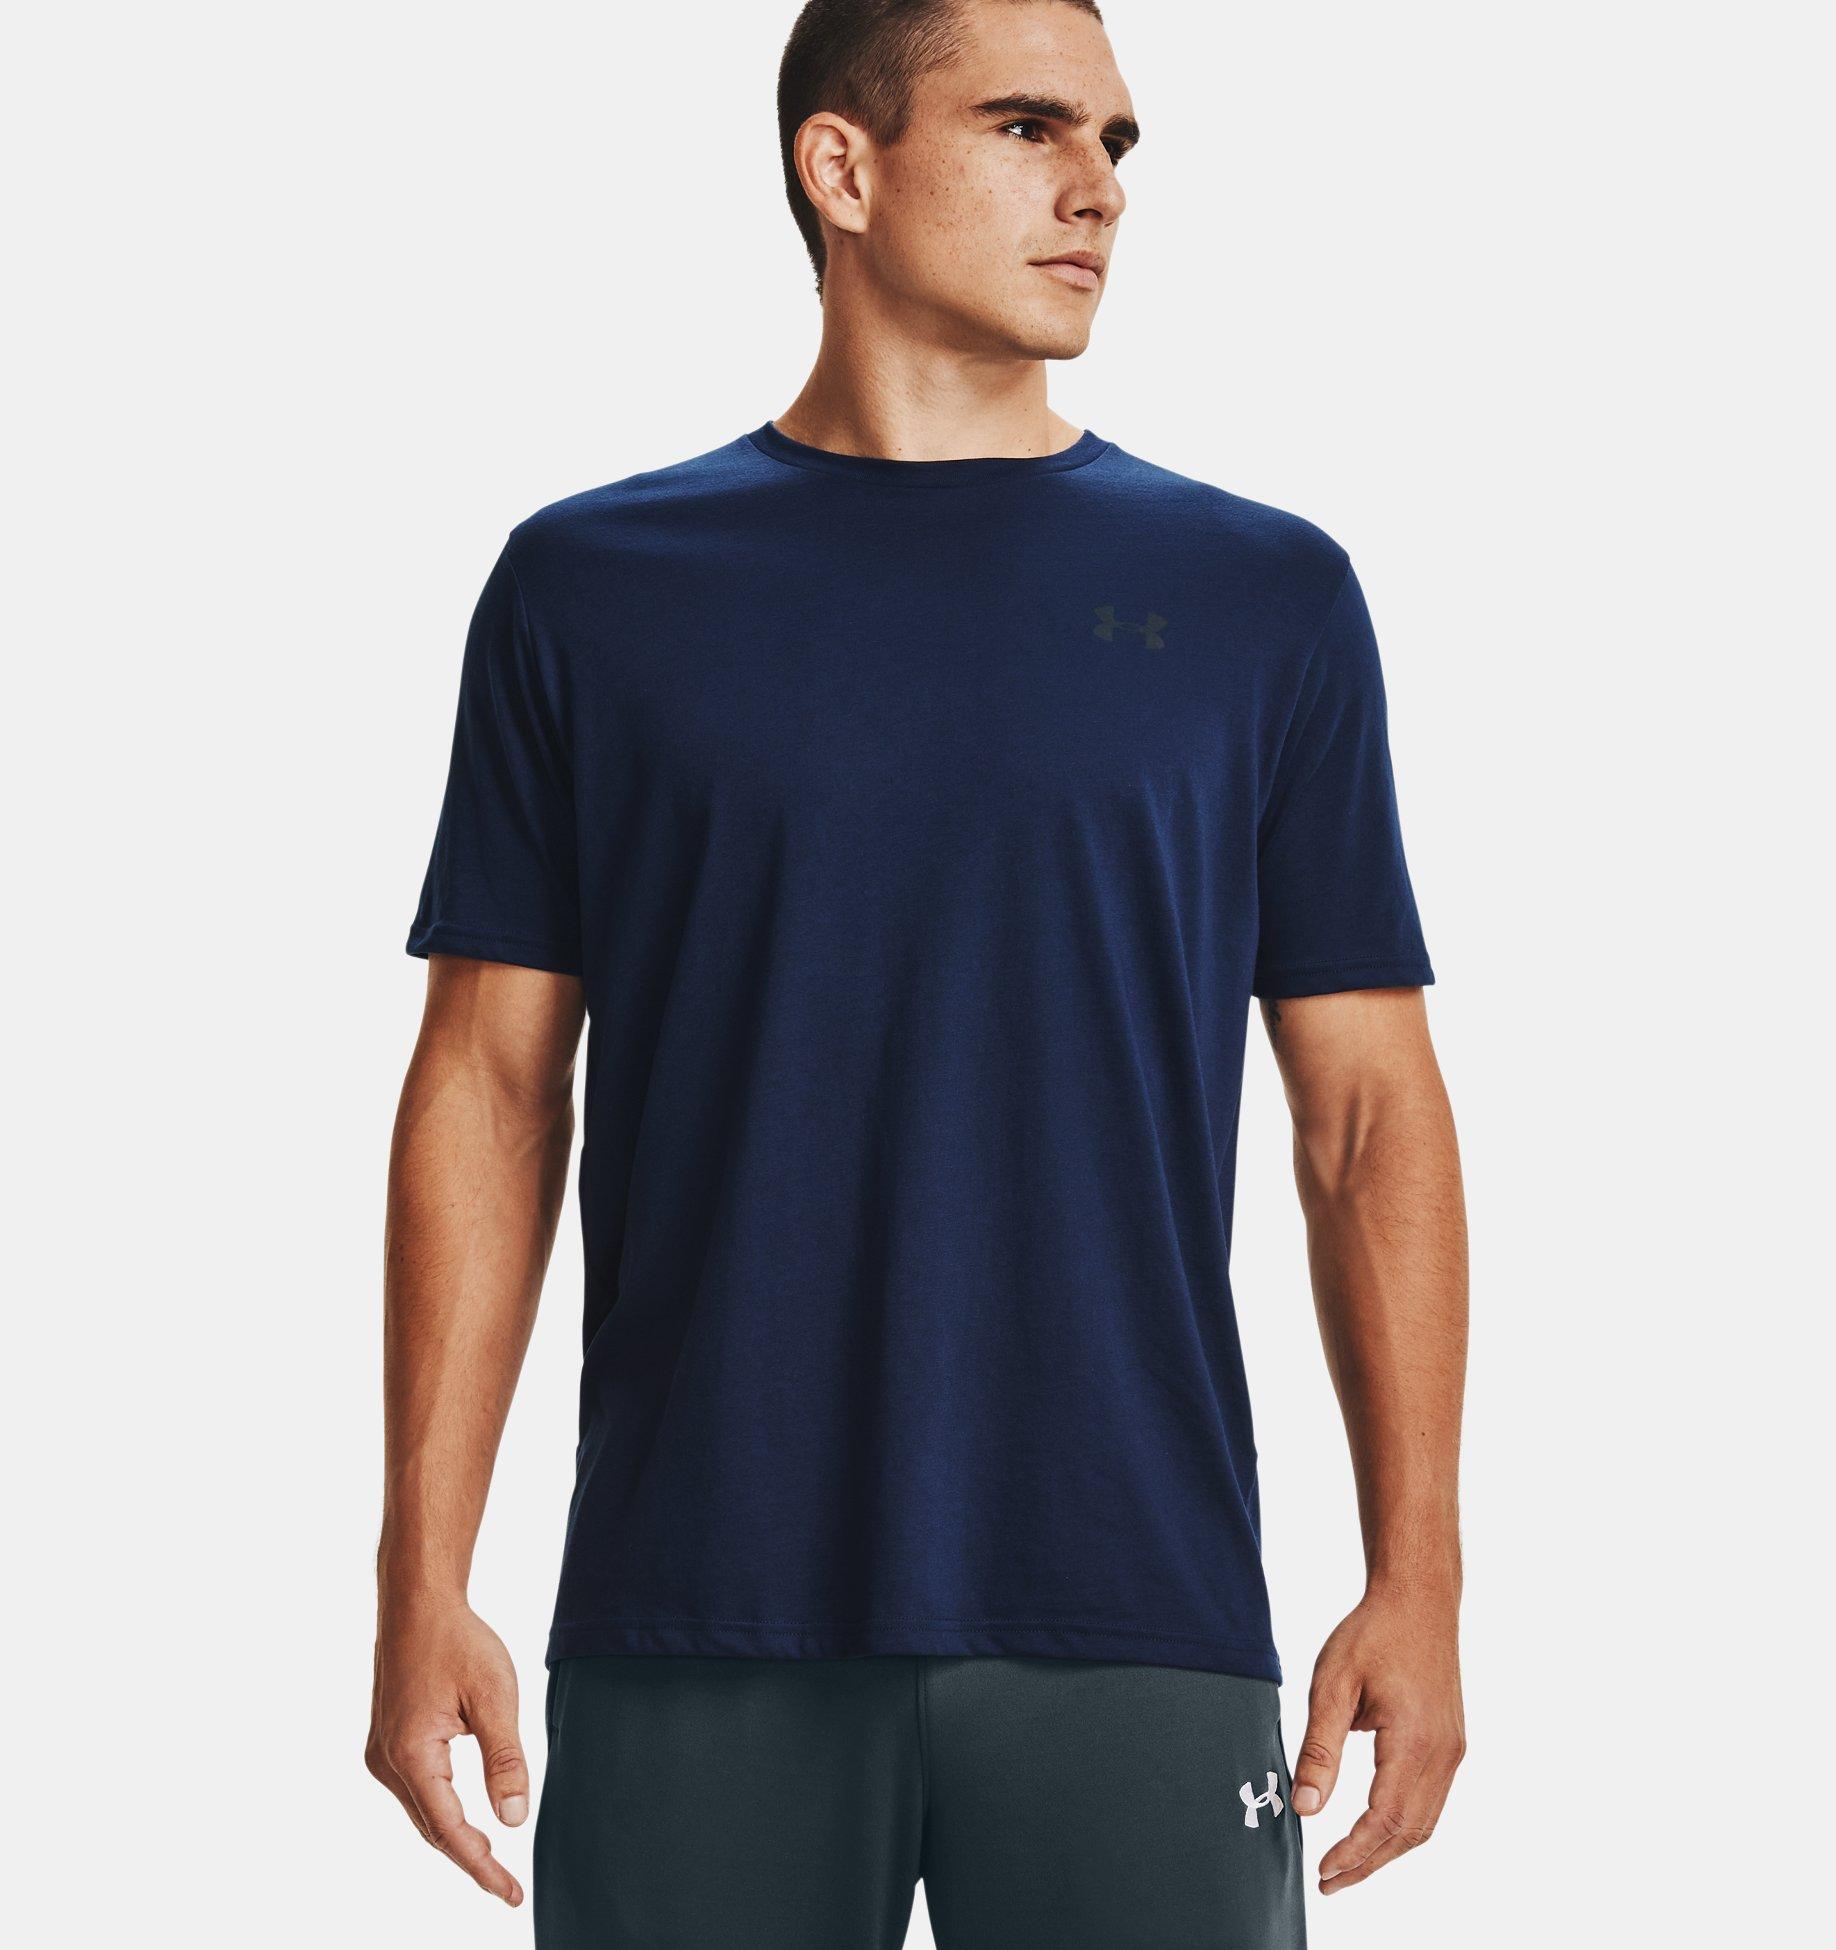 Underarmour Mens UA Left Chest Lockup T-Shirt